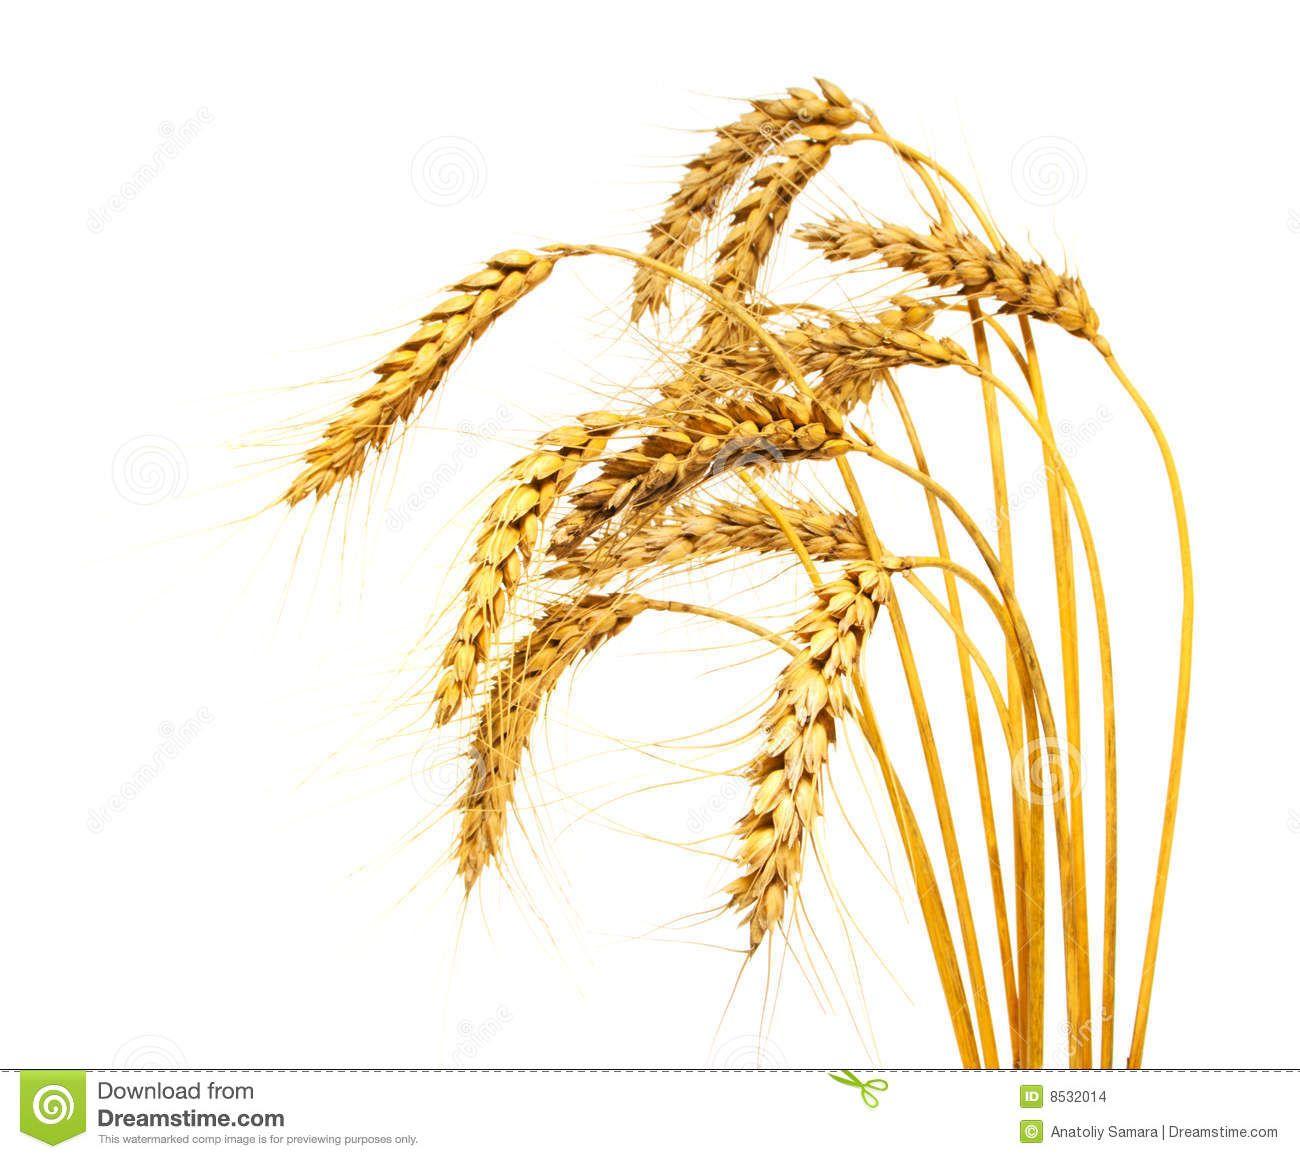 Crops clipart wheat barley. Stalk slp in